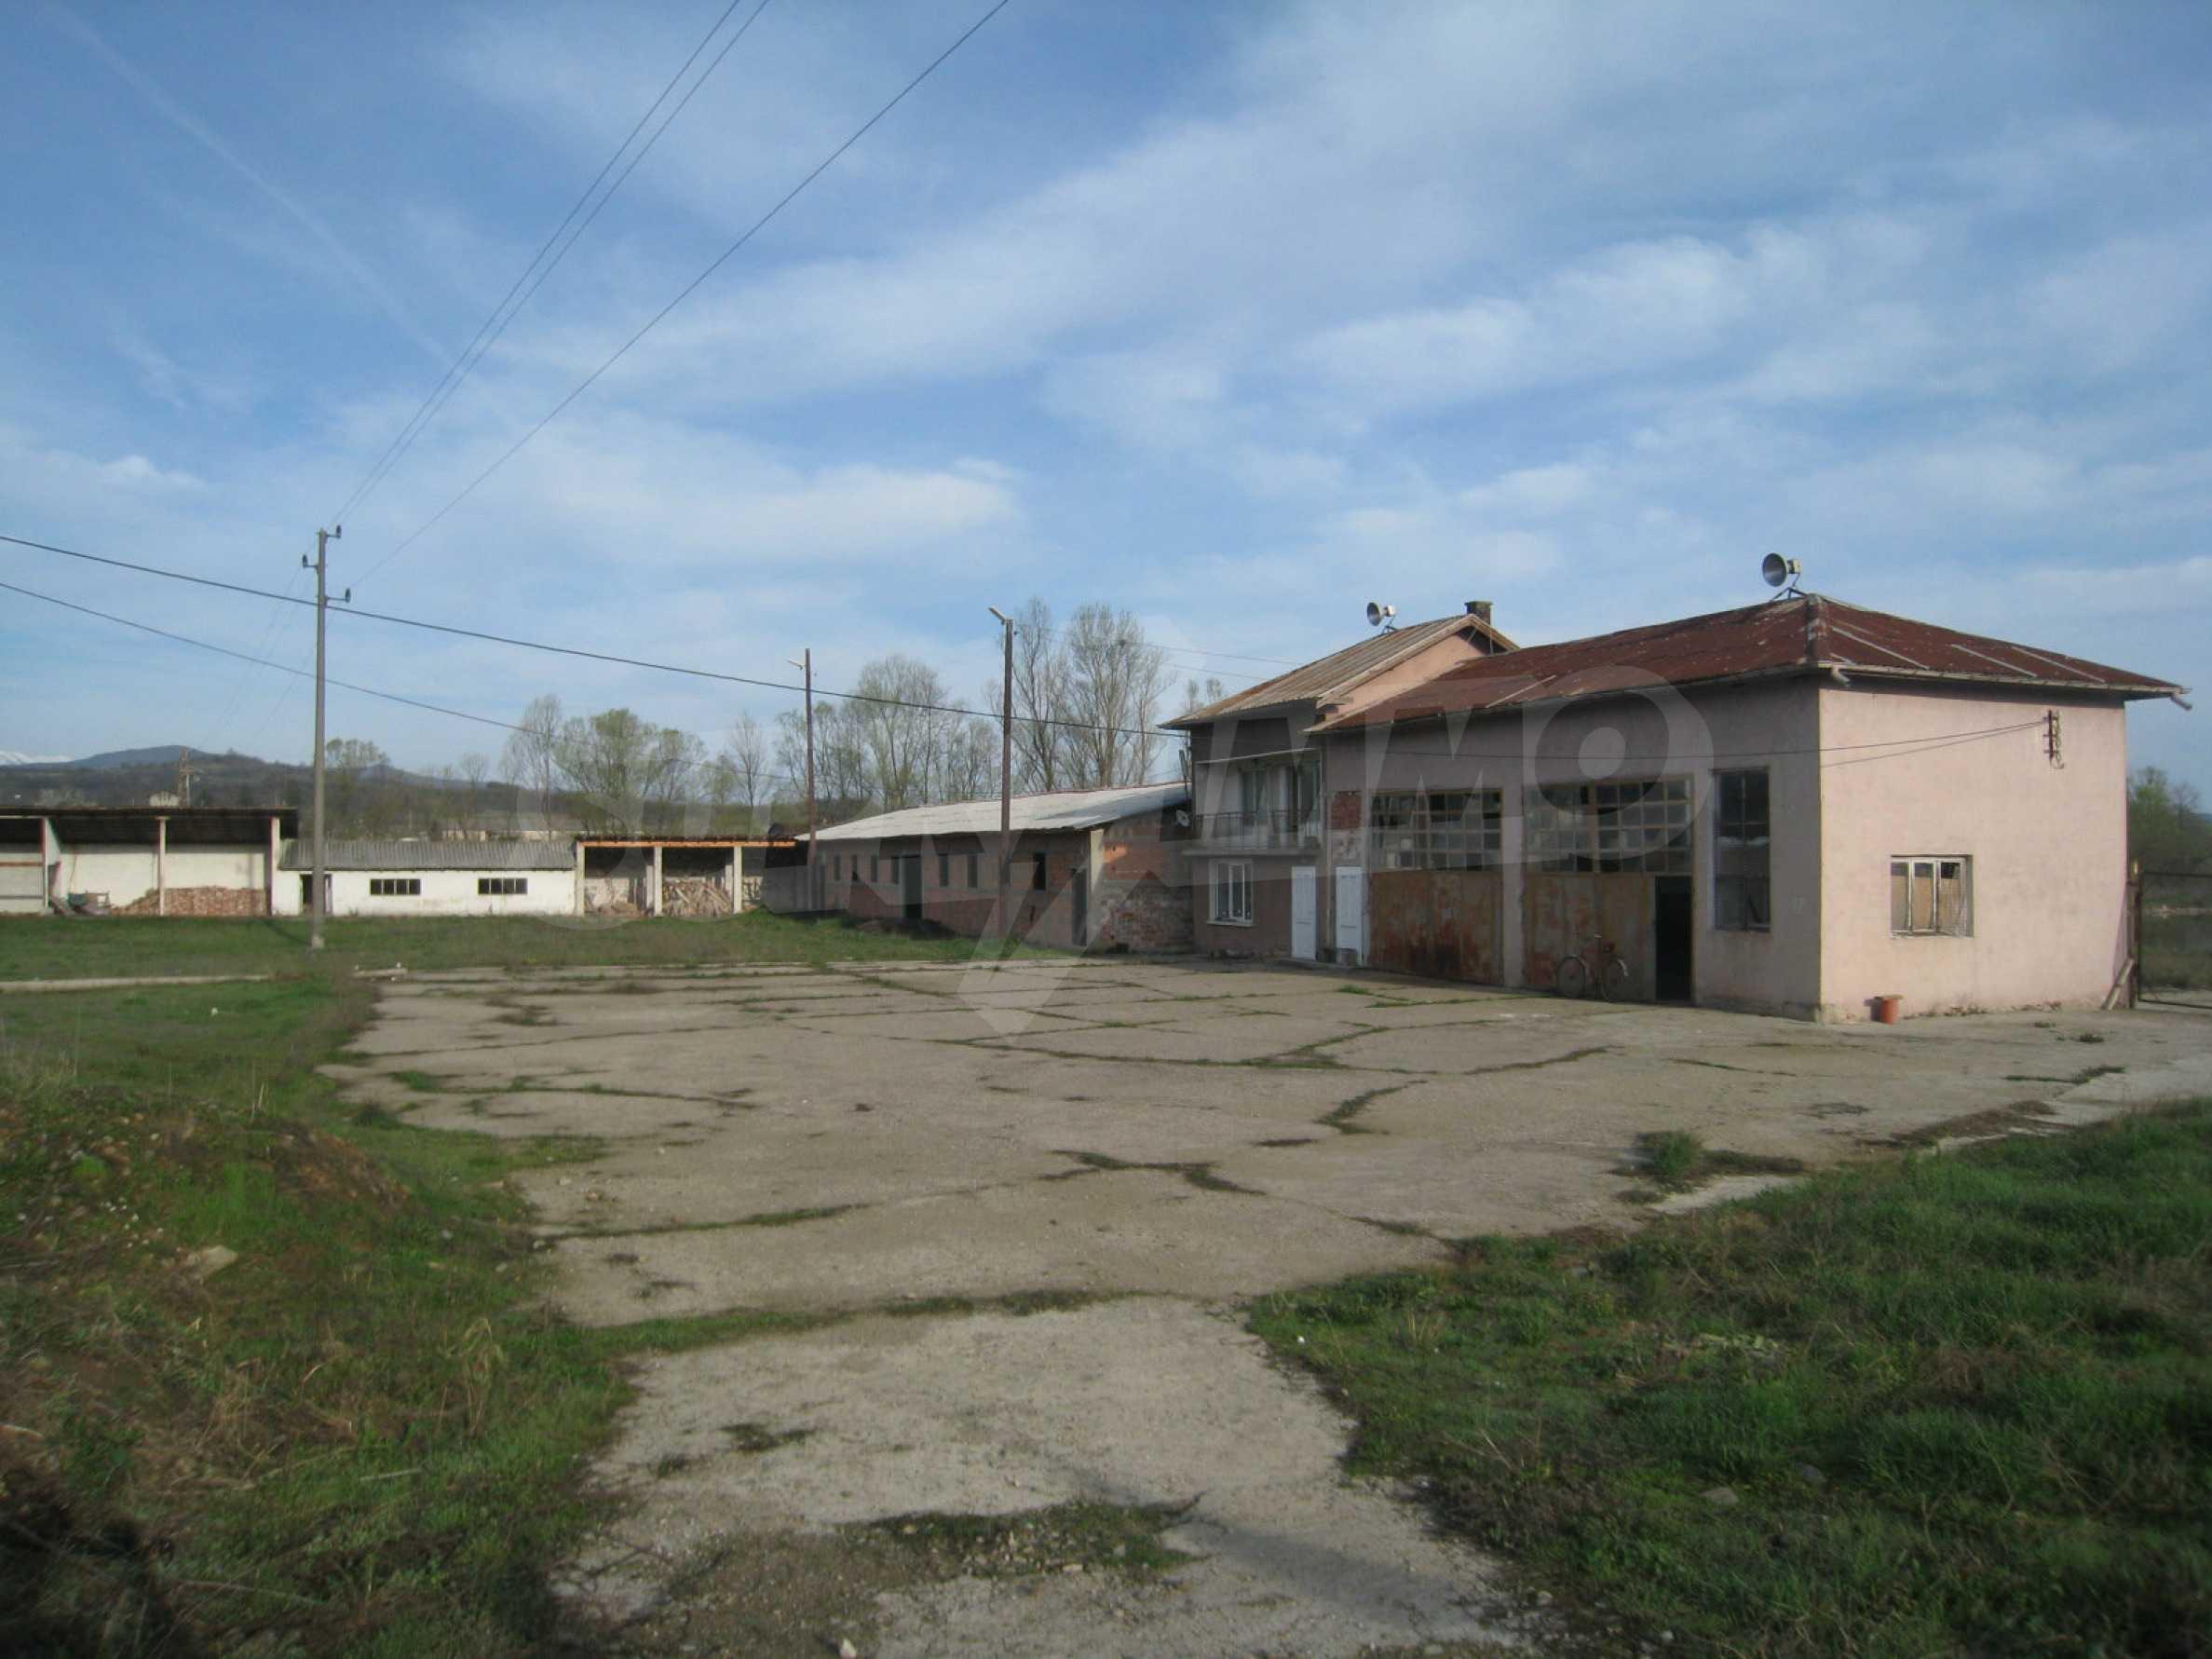 Fishpond, warehouses, residential areas and asphalt ground near Montana 16